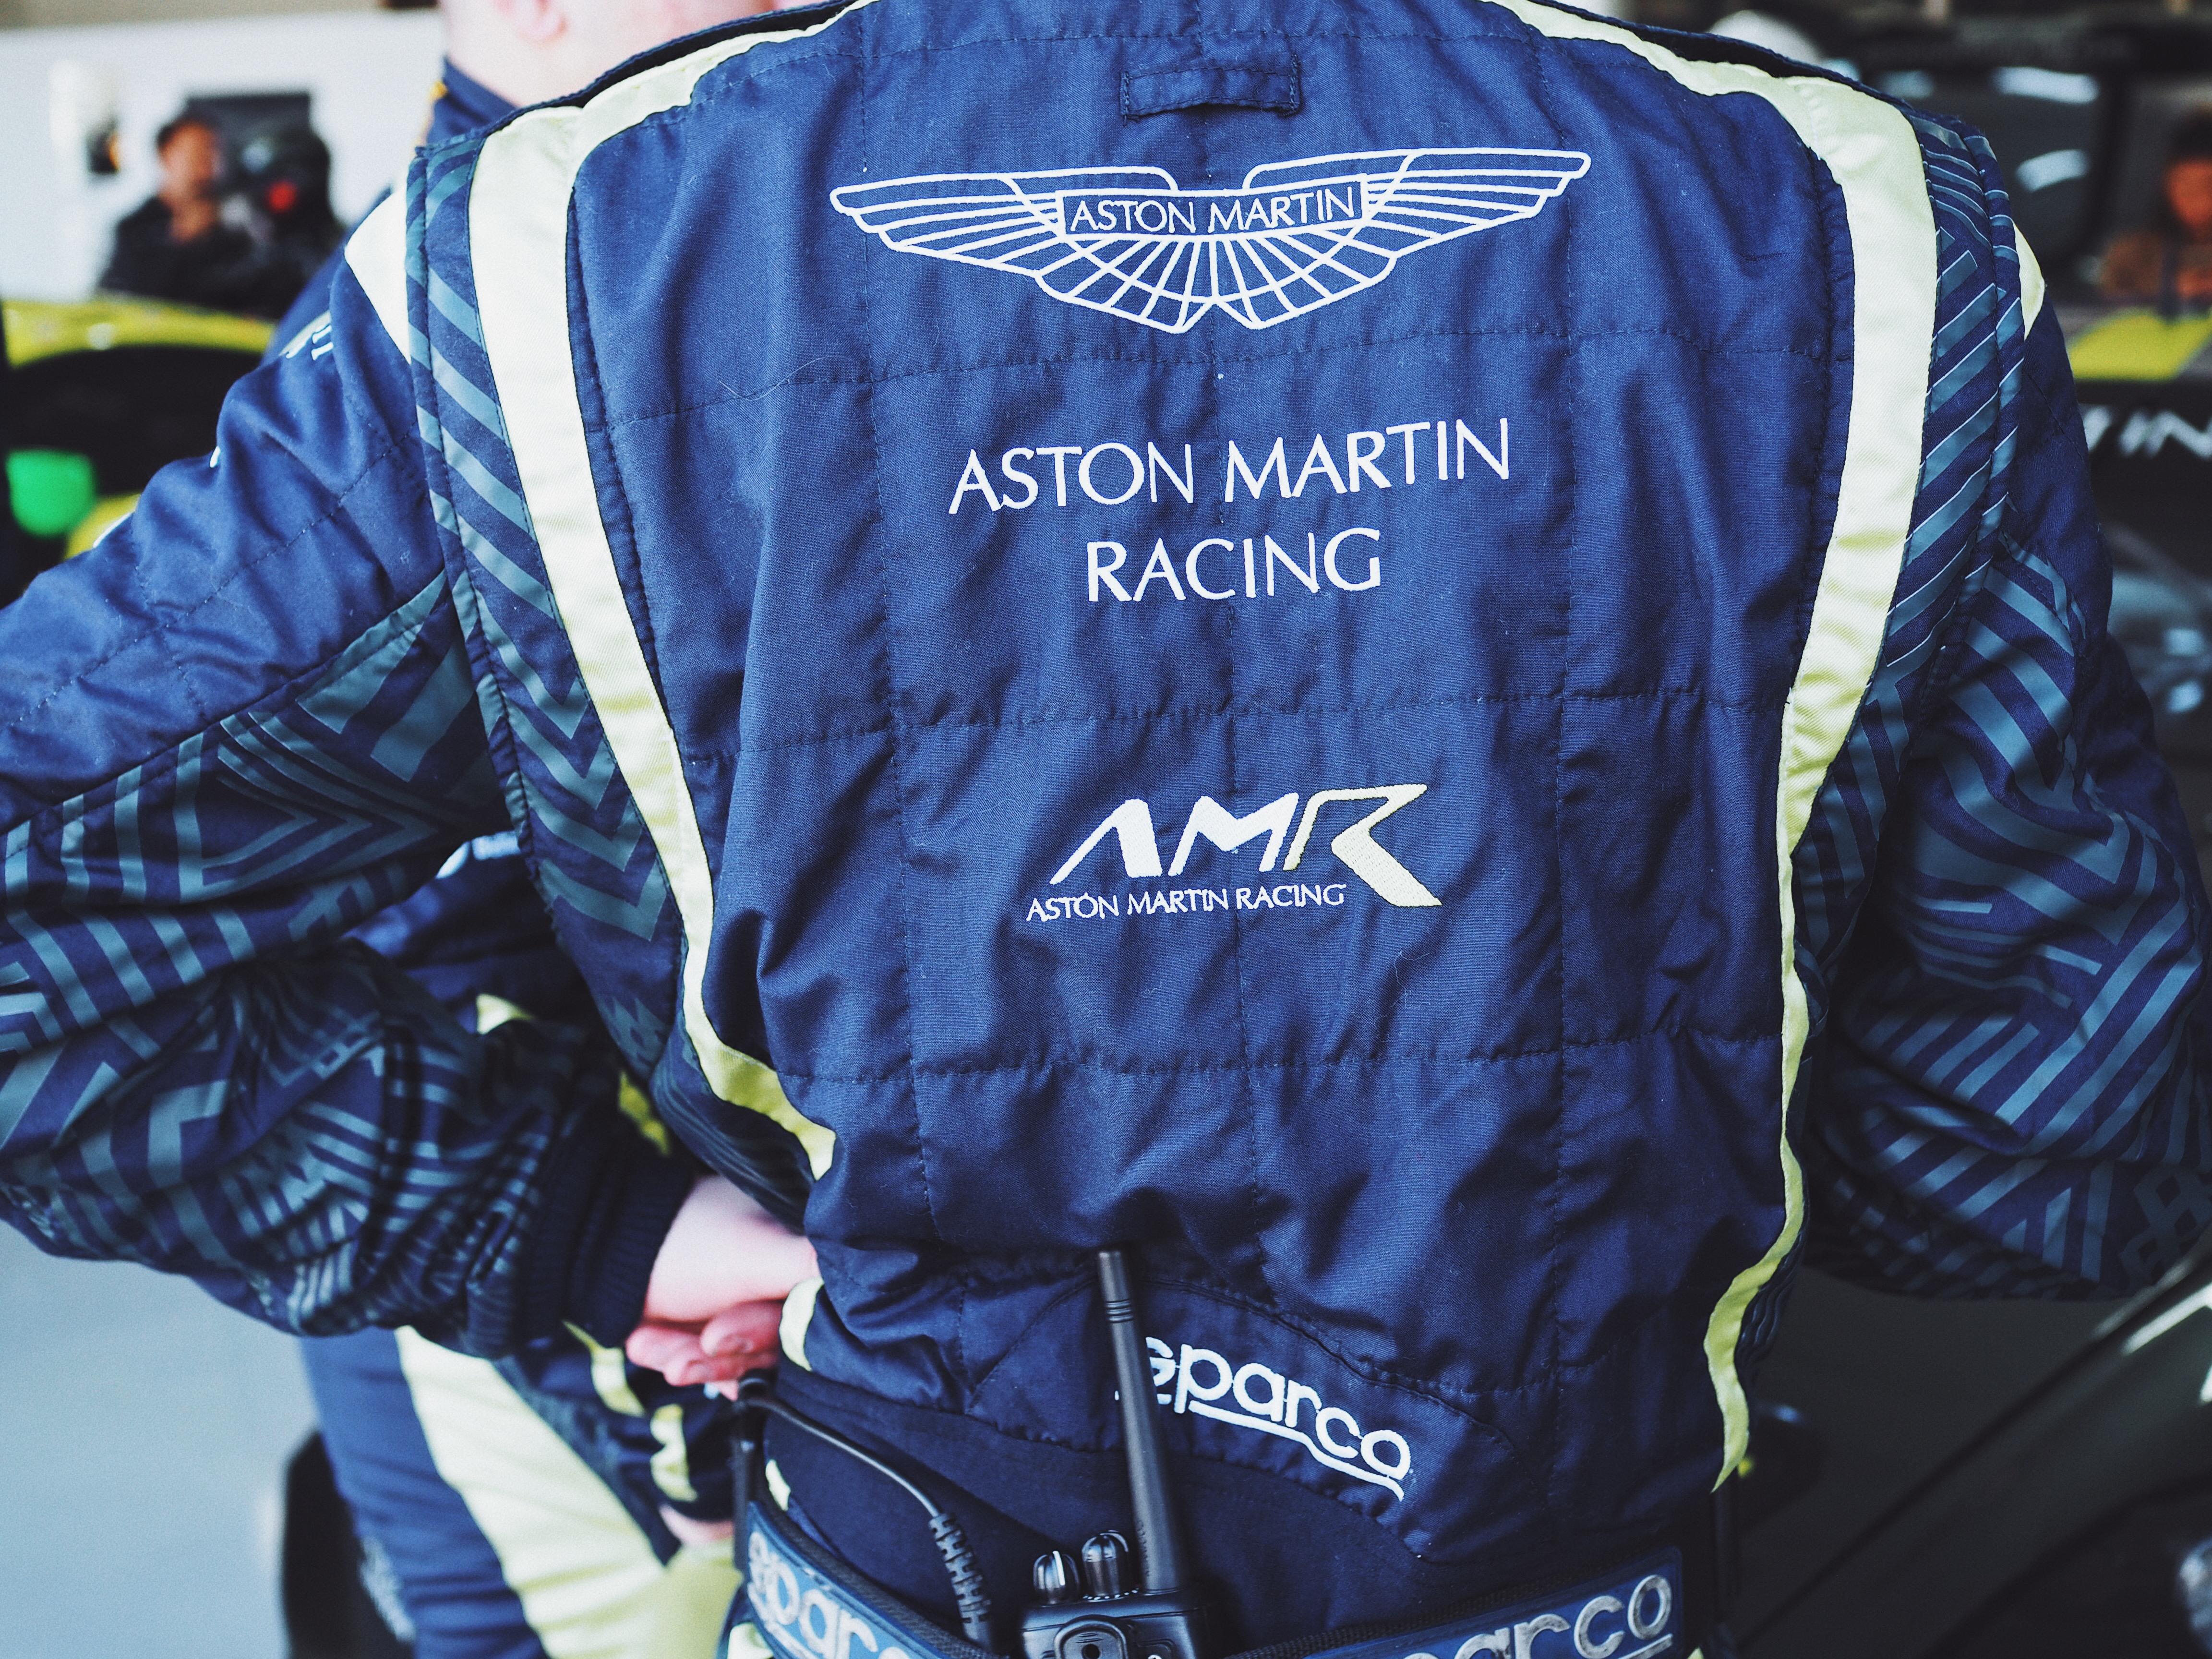 _ilcarritzi_nice_hackett_aston_martin_cote_dazur_french_riviera_paul_ricard_circuit_racing_formula_1_